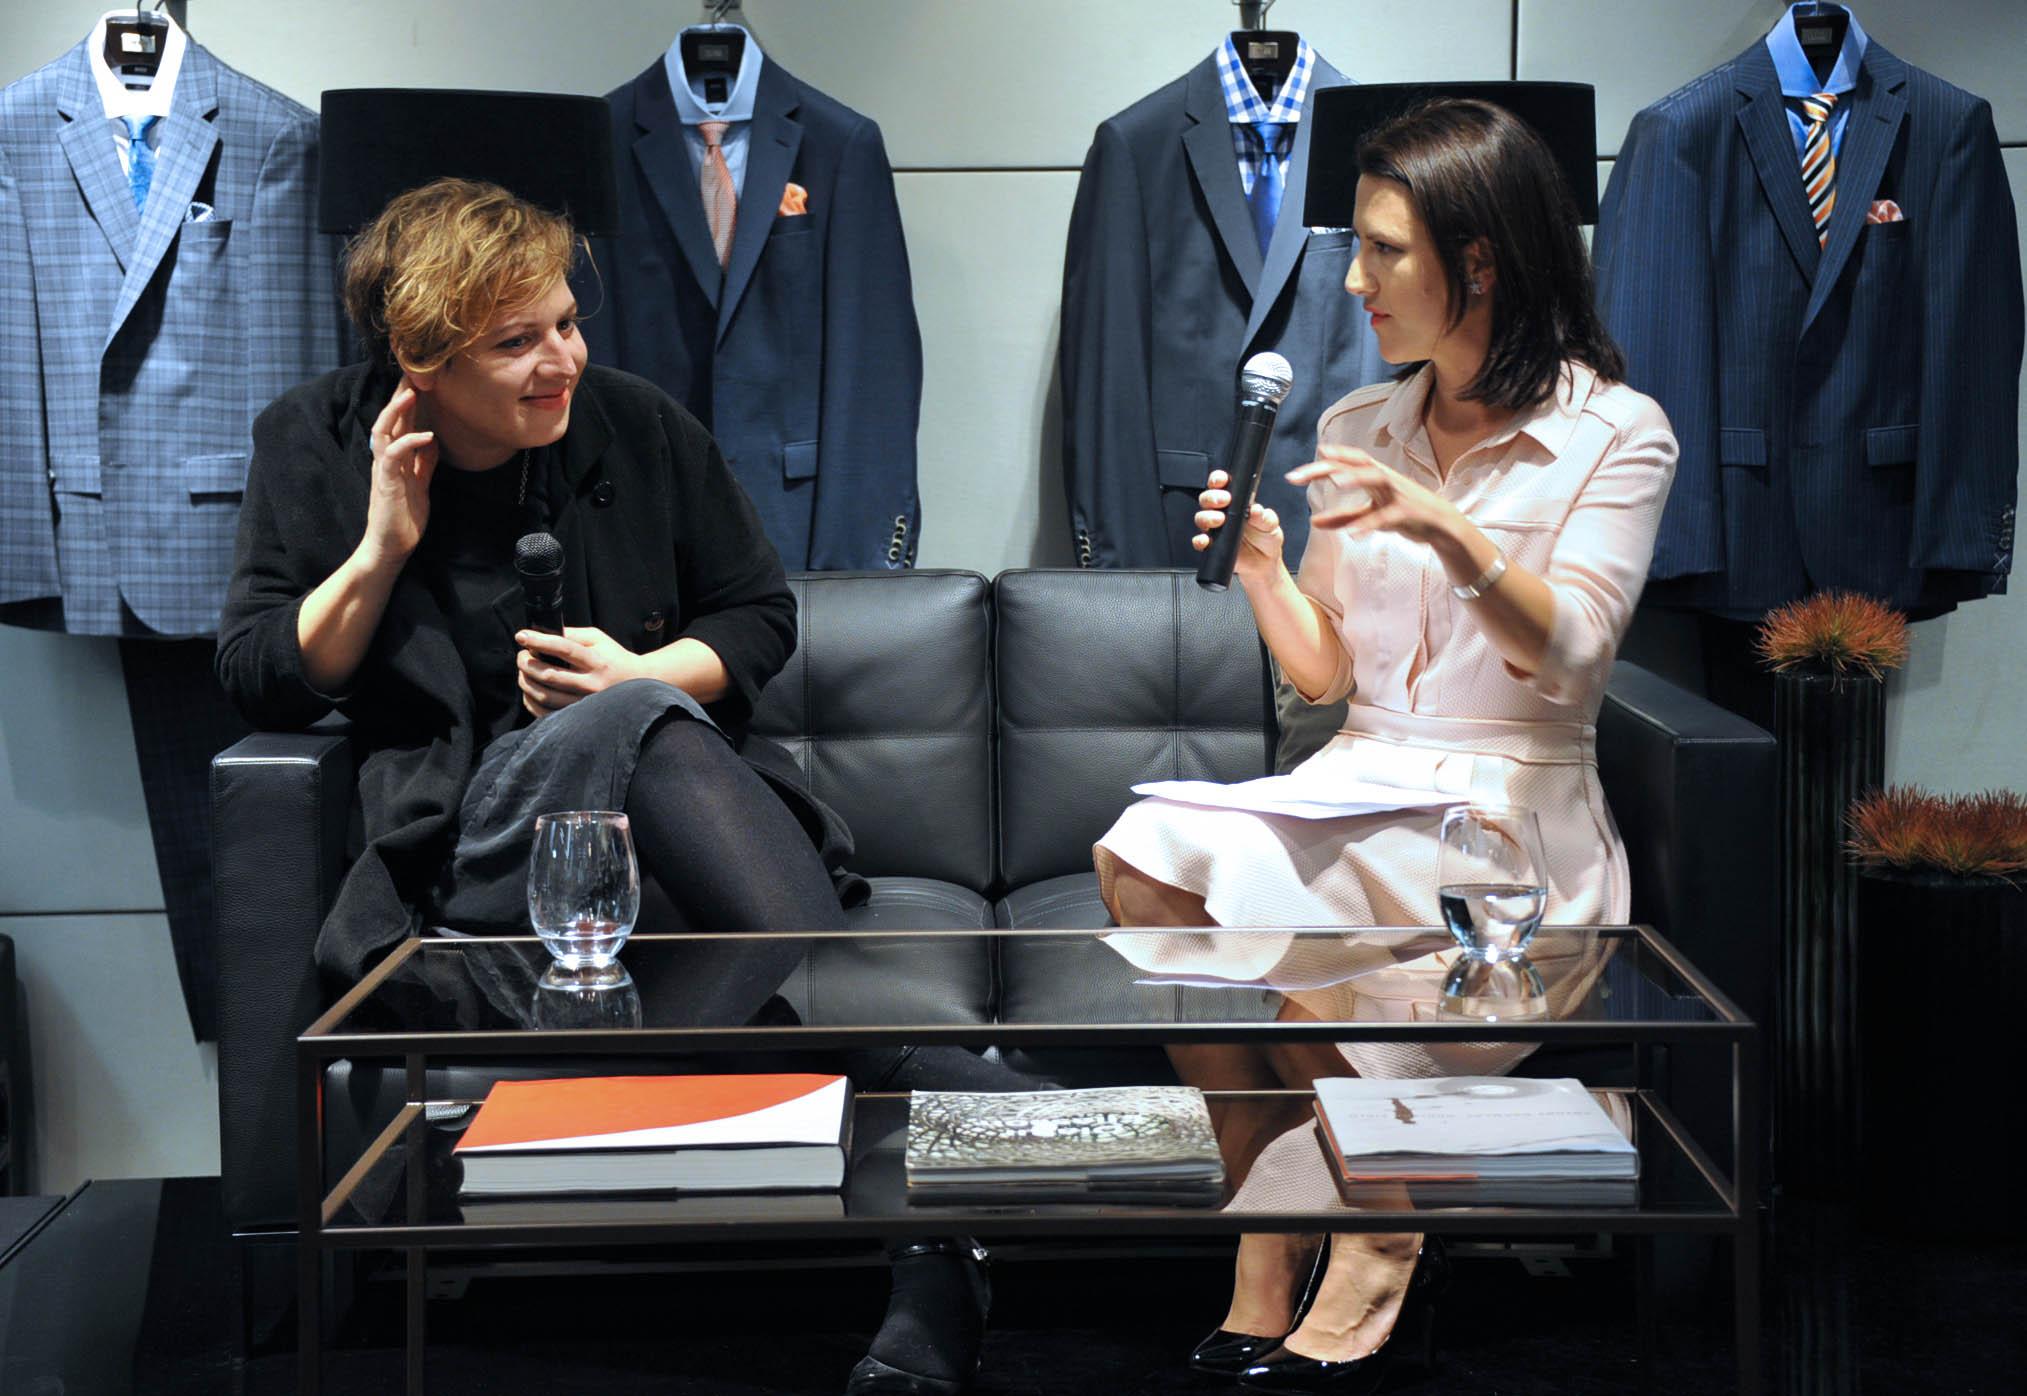 MCA's Primavera artist Marian Tubbs and VOGUE Deputy Editor Sophie Tedmanson